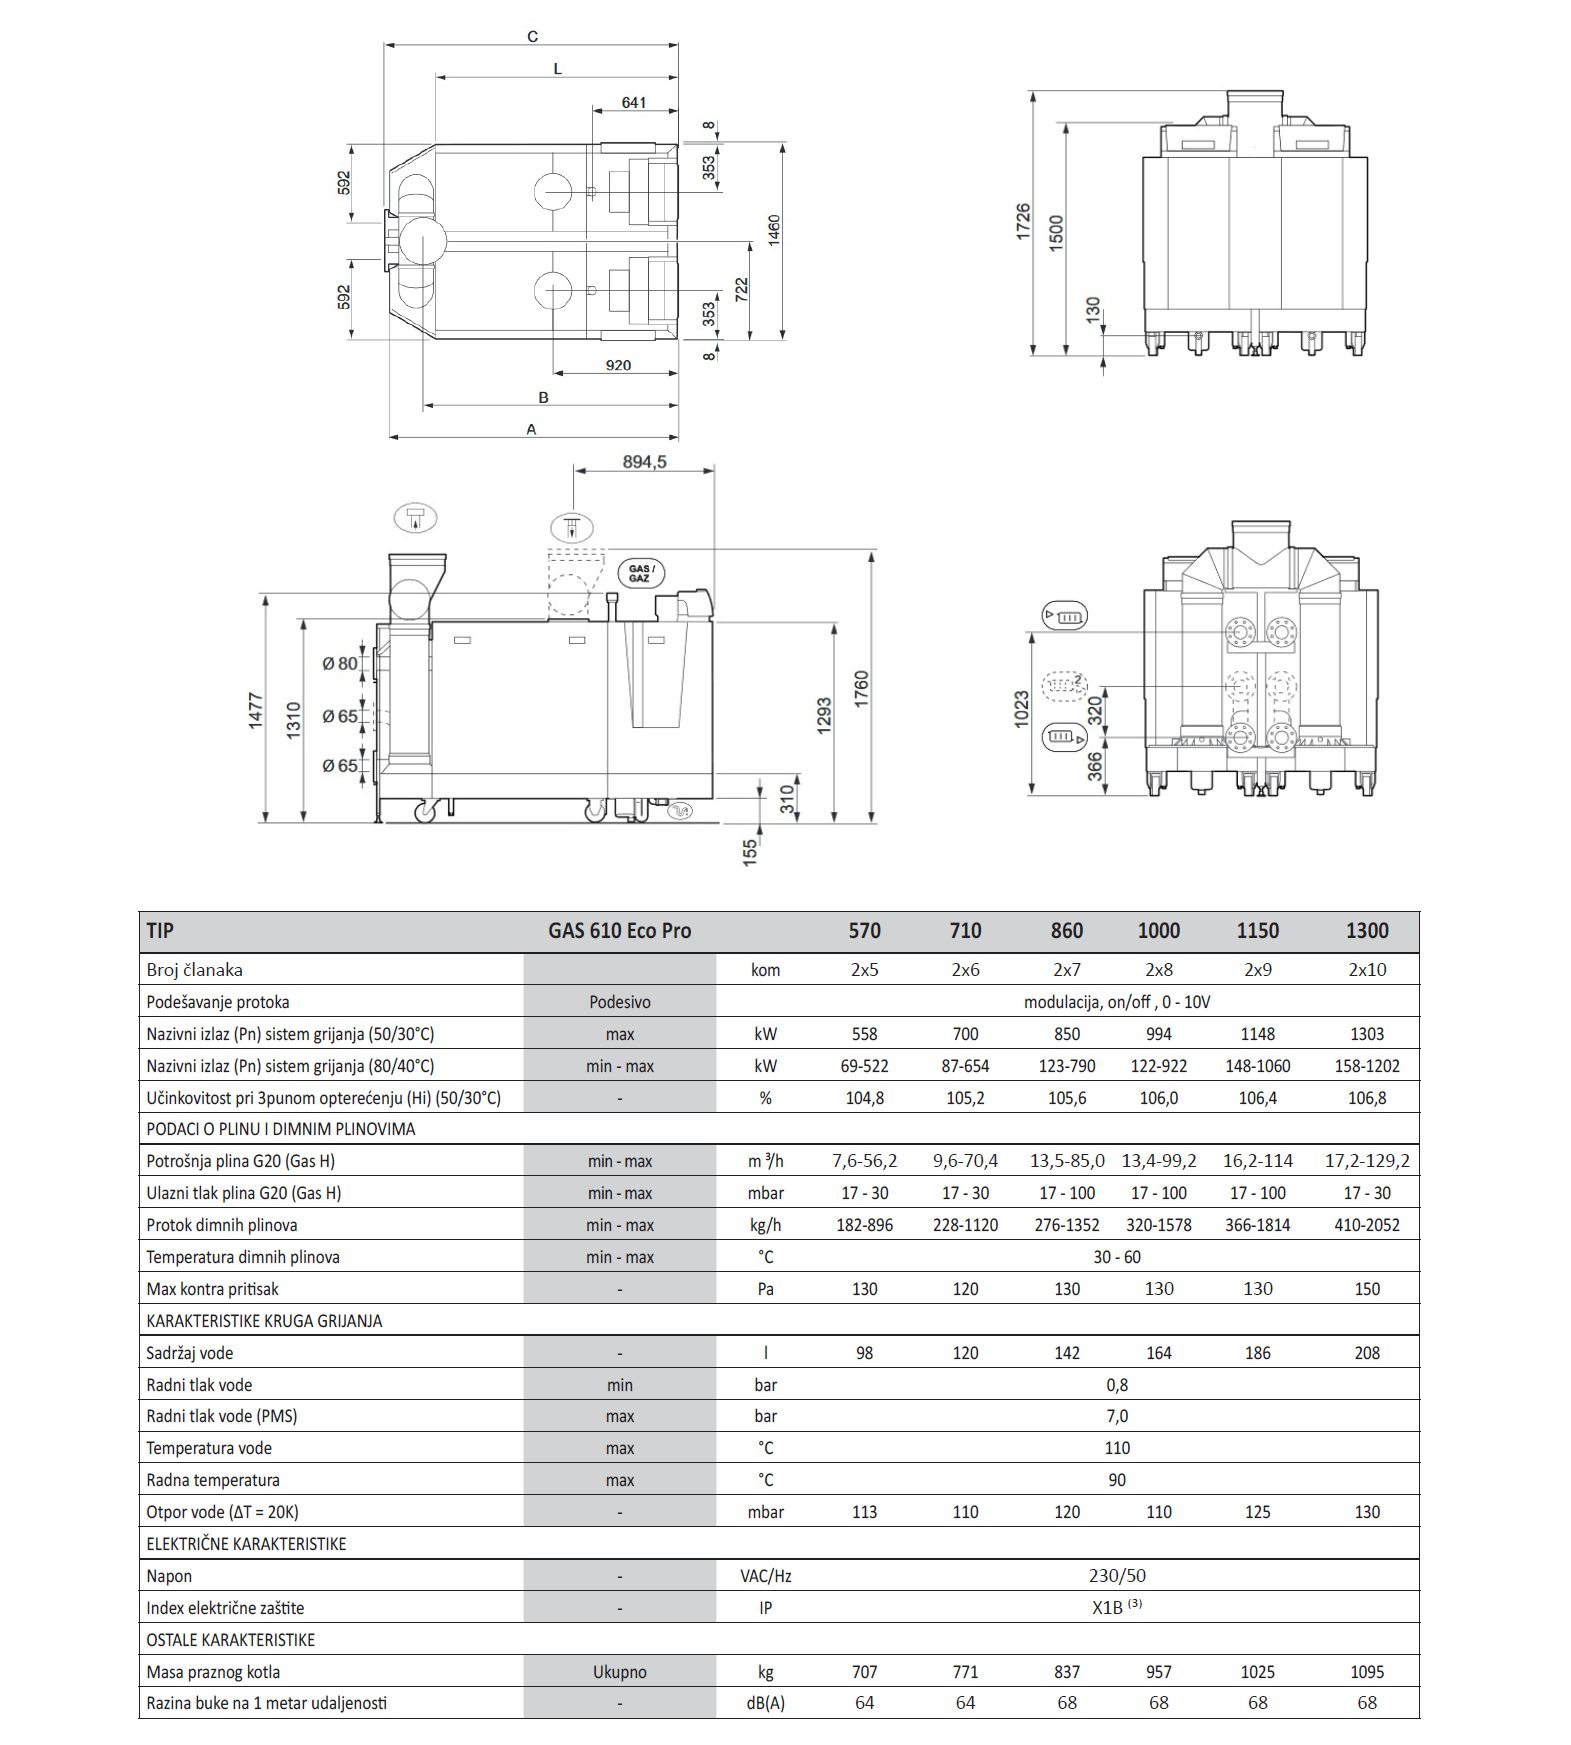 GAS 610 ECO PRO